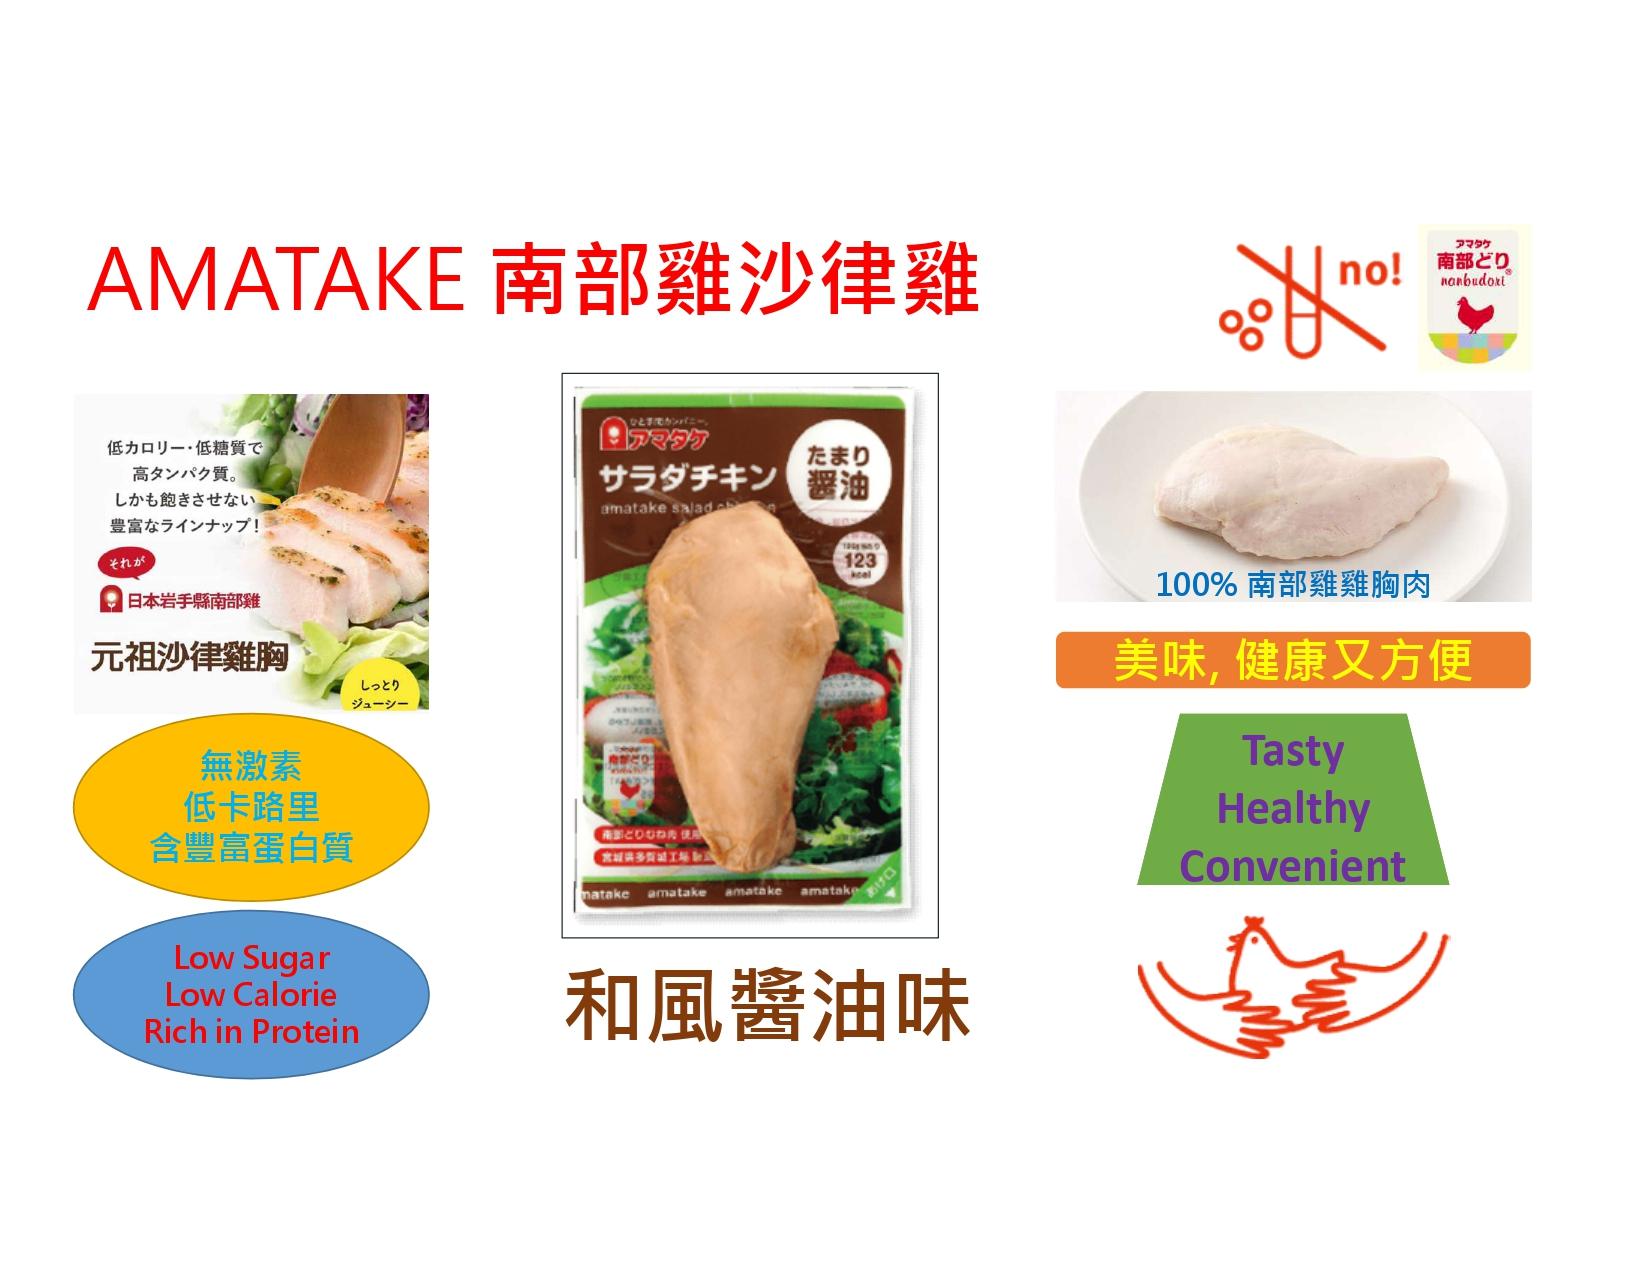 南部雞沙律雞 店鋪 CATALOG (29-08-20)_page-0007